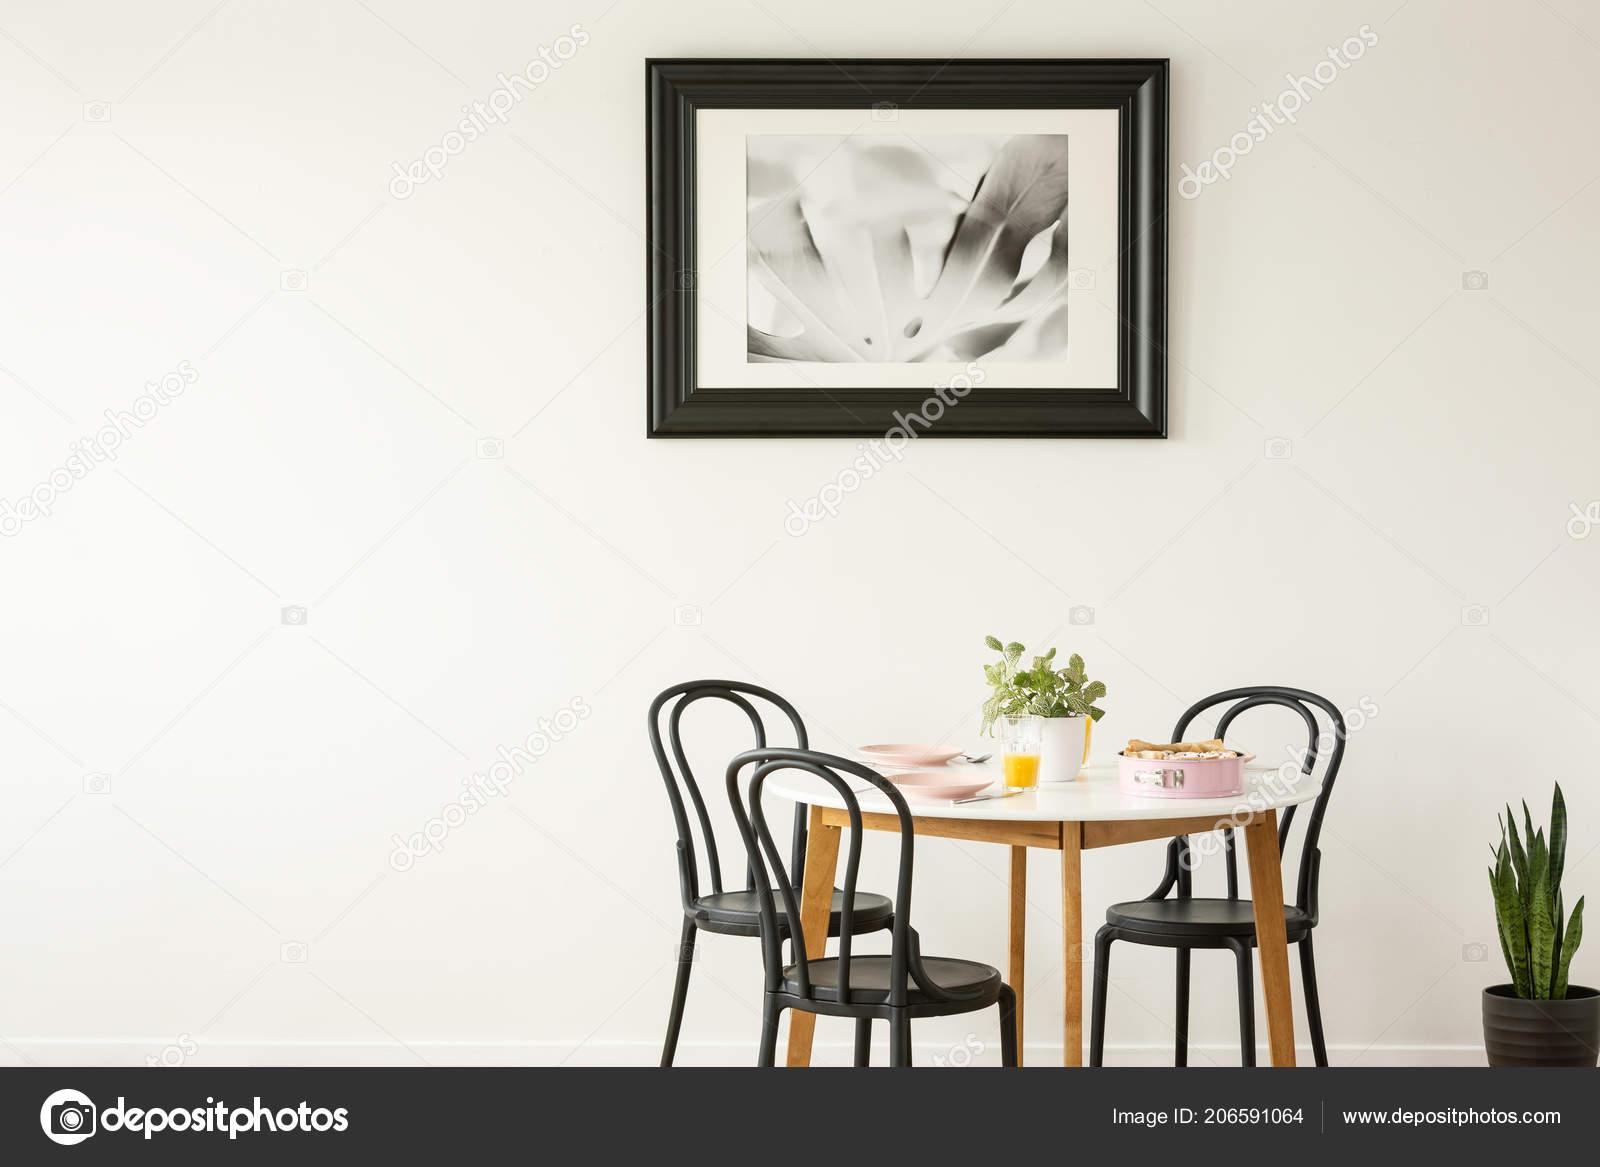 Foto Di Una Tavola Imbandita.Foto Reale Una Tavola Imbandita Pranzo Con Sedie Nere Pittura Foto